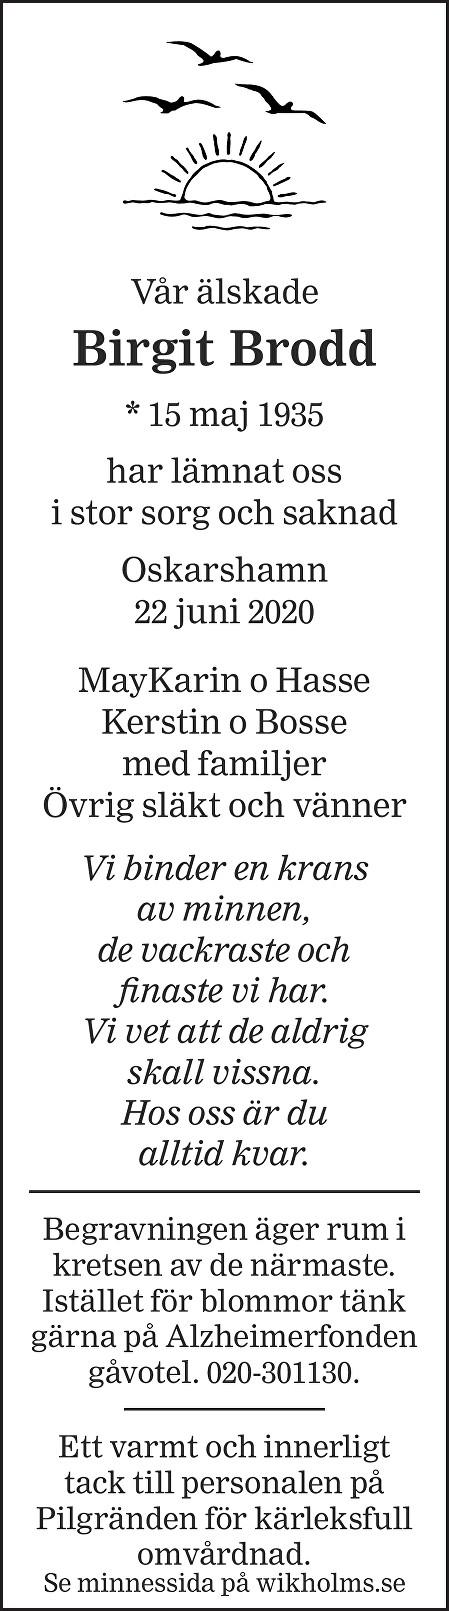 Birgit Brodd Death notice